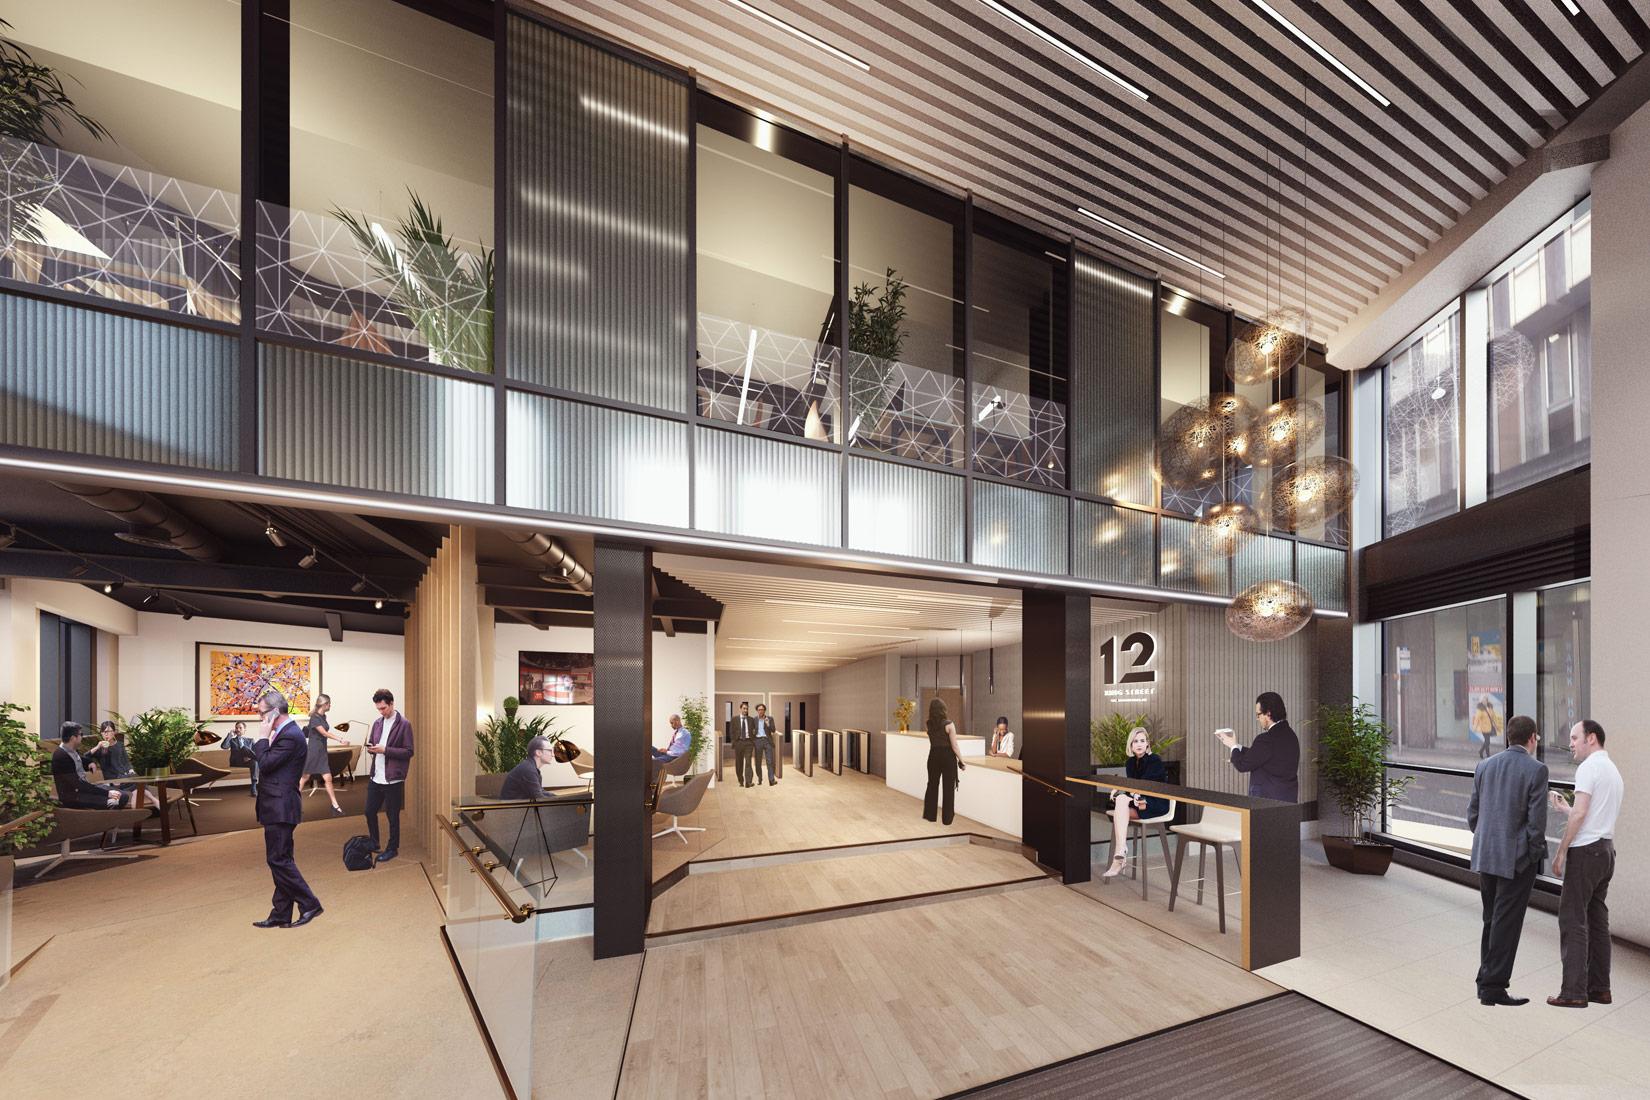 12 King Street, Leeds, 3D visual of reception